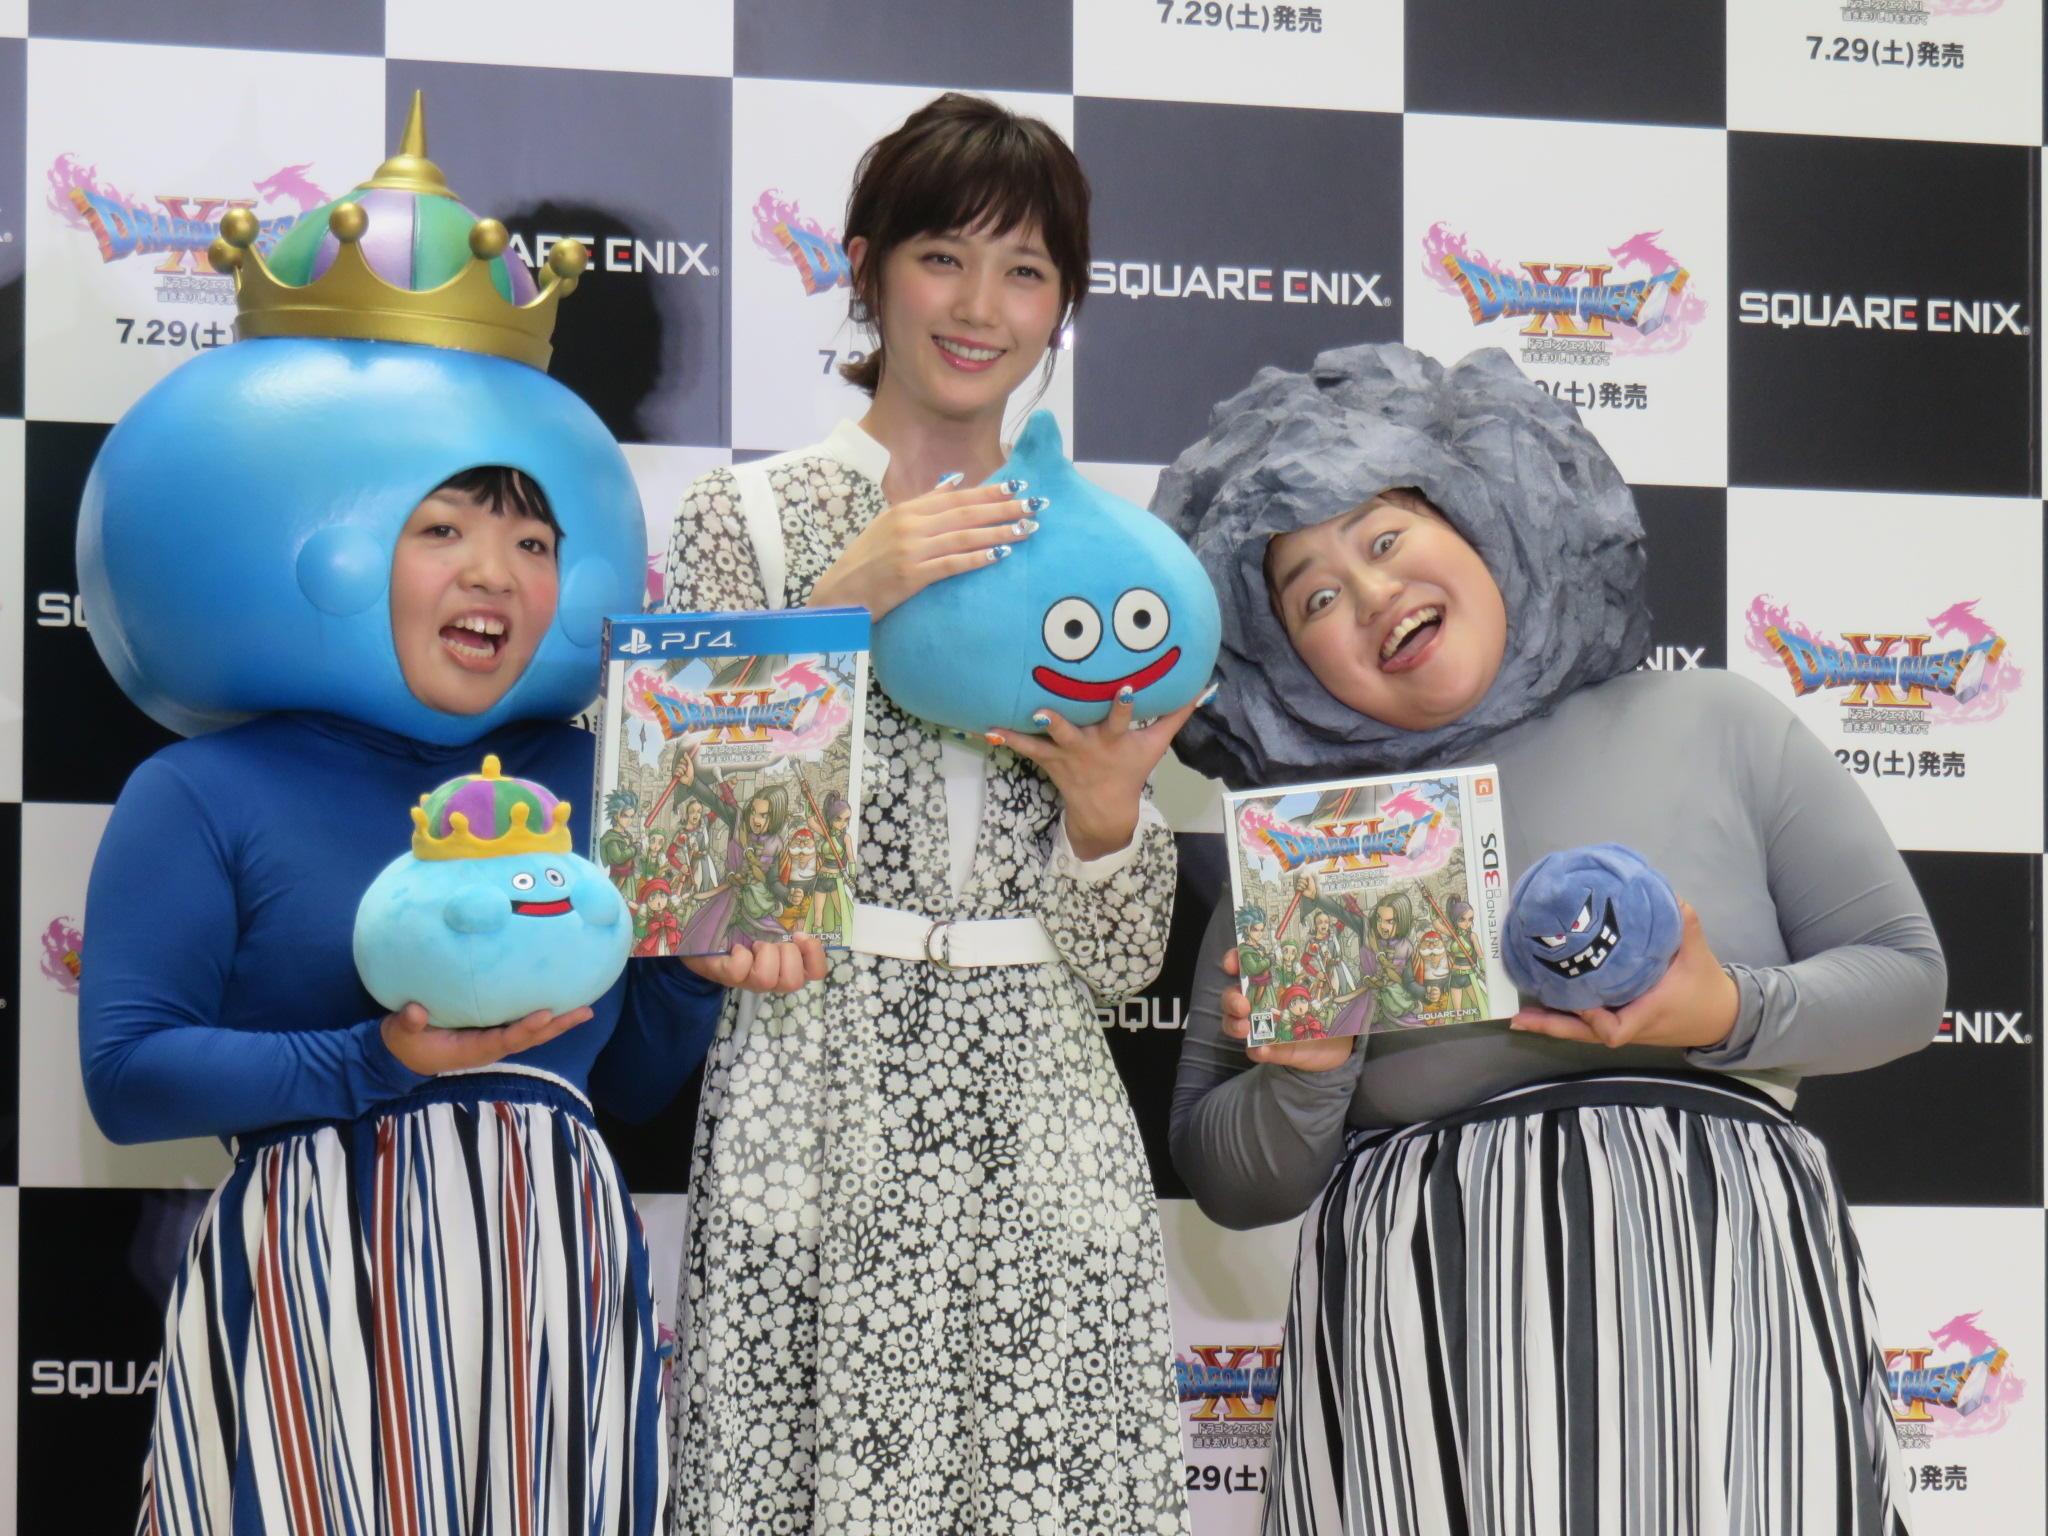 http://news.yoshimoto.co.jp/20170717230305-dccb146b2c42e71cbce3be0f1a884ae2d178258d.jpg